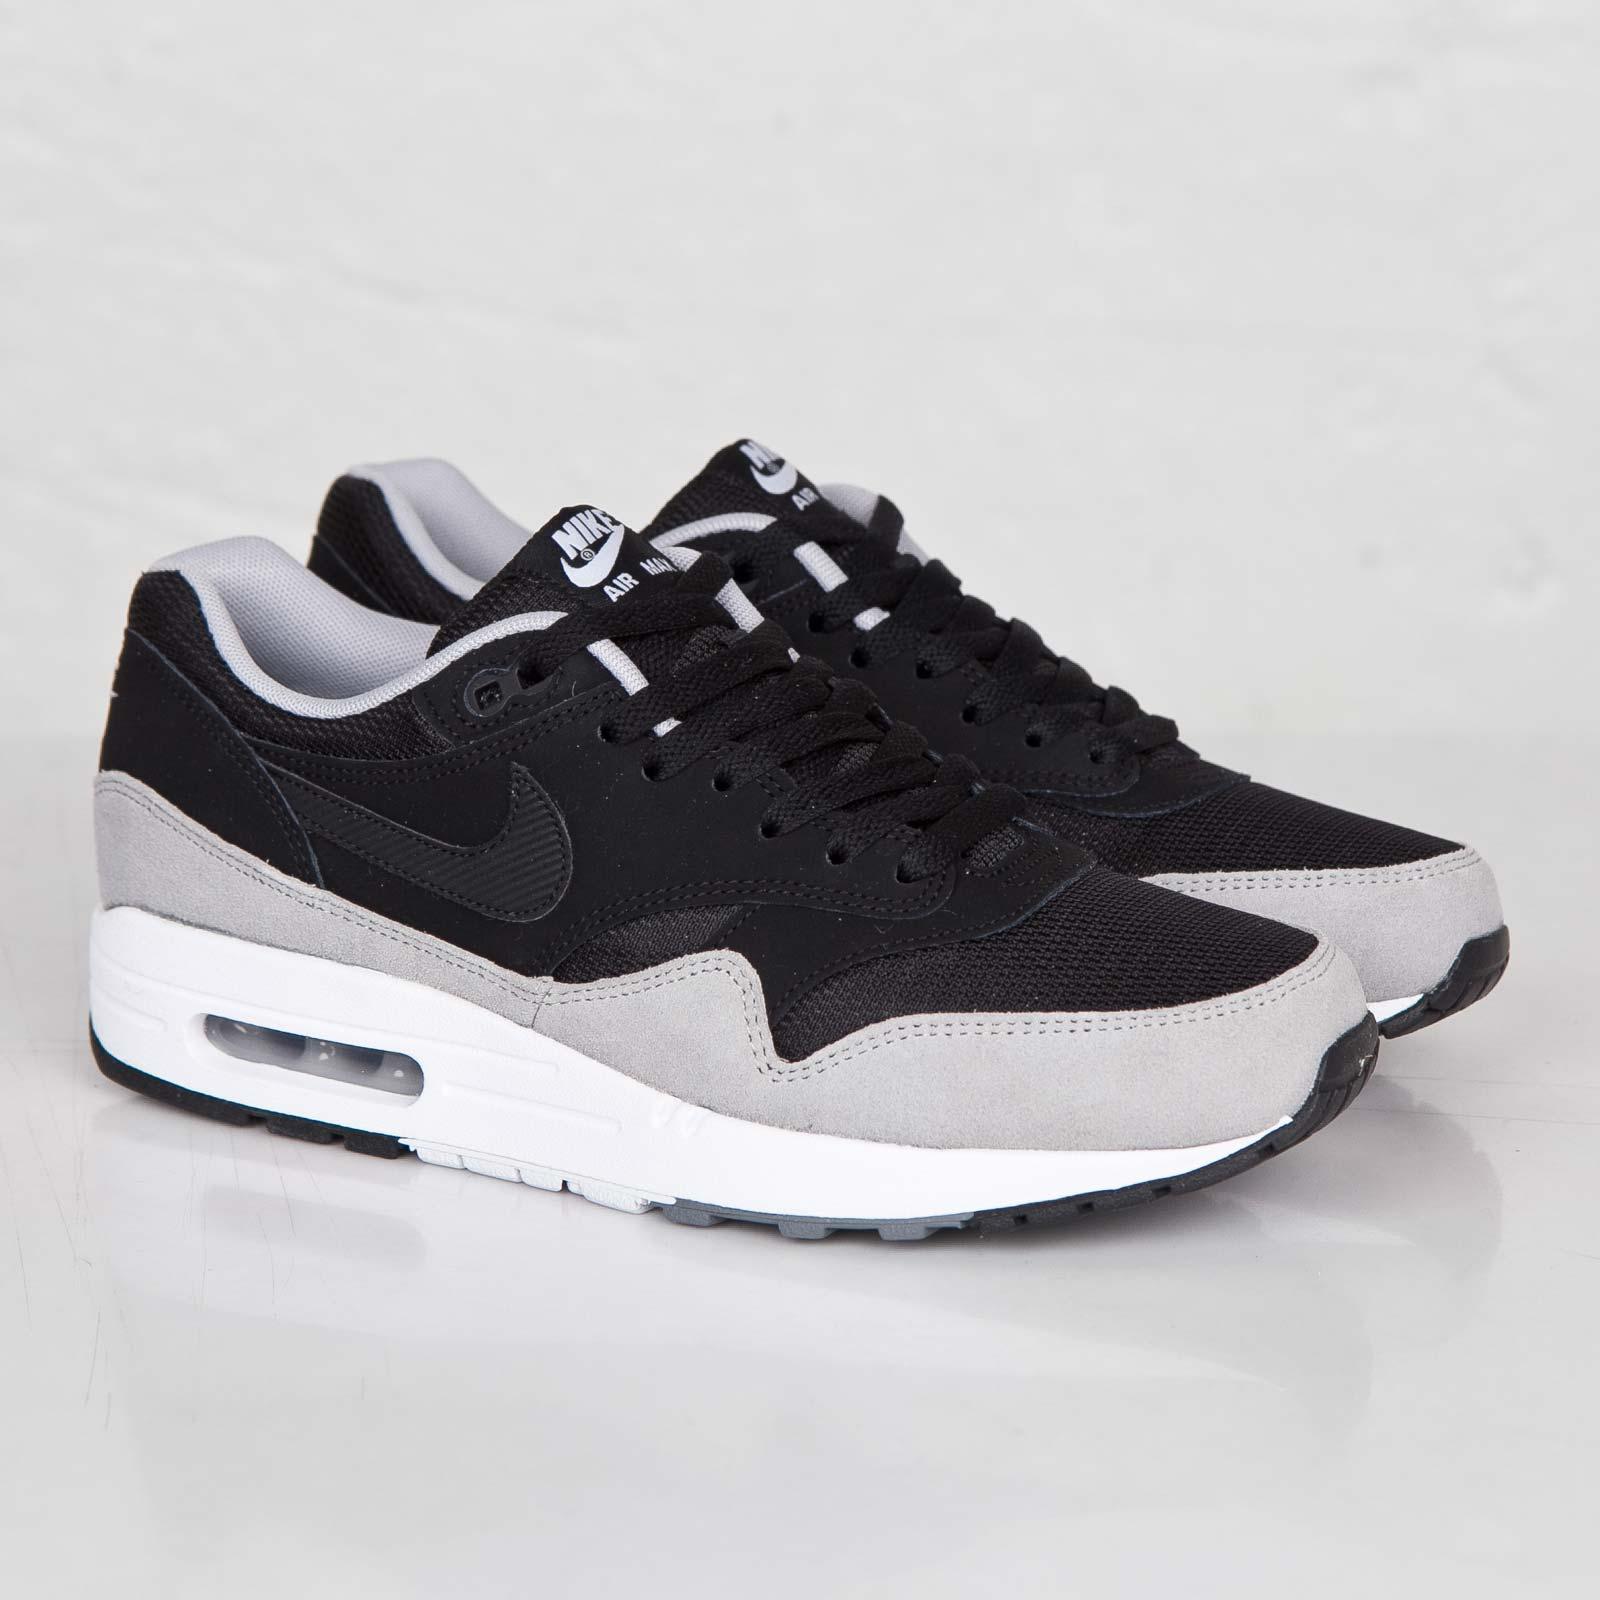 Nike Air Max 1 Essential Grey Suede – 537383 021  AFEW STORE